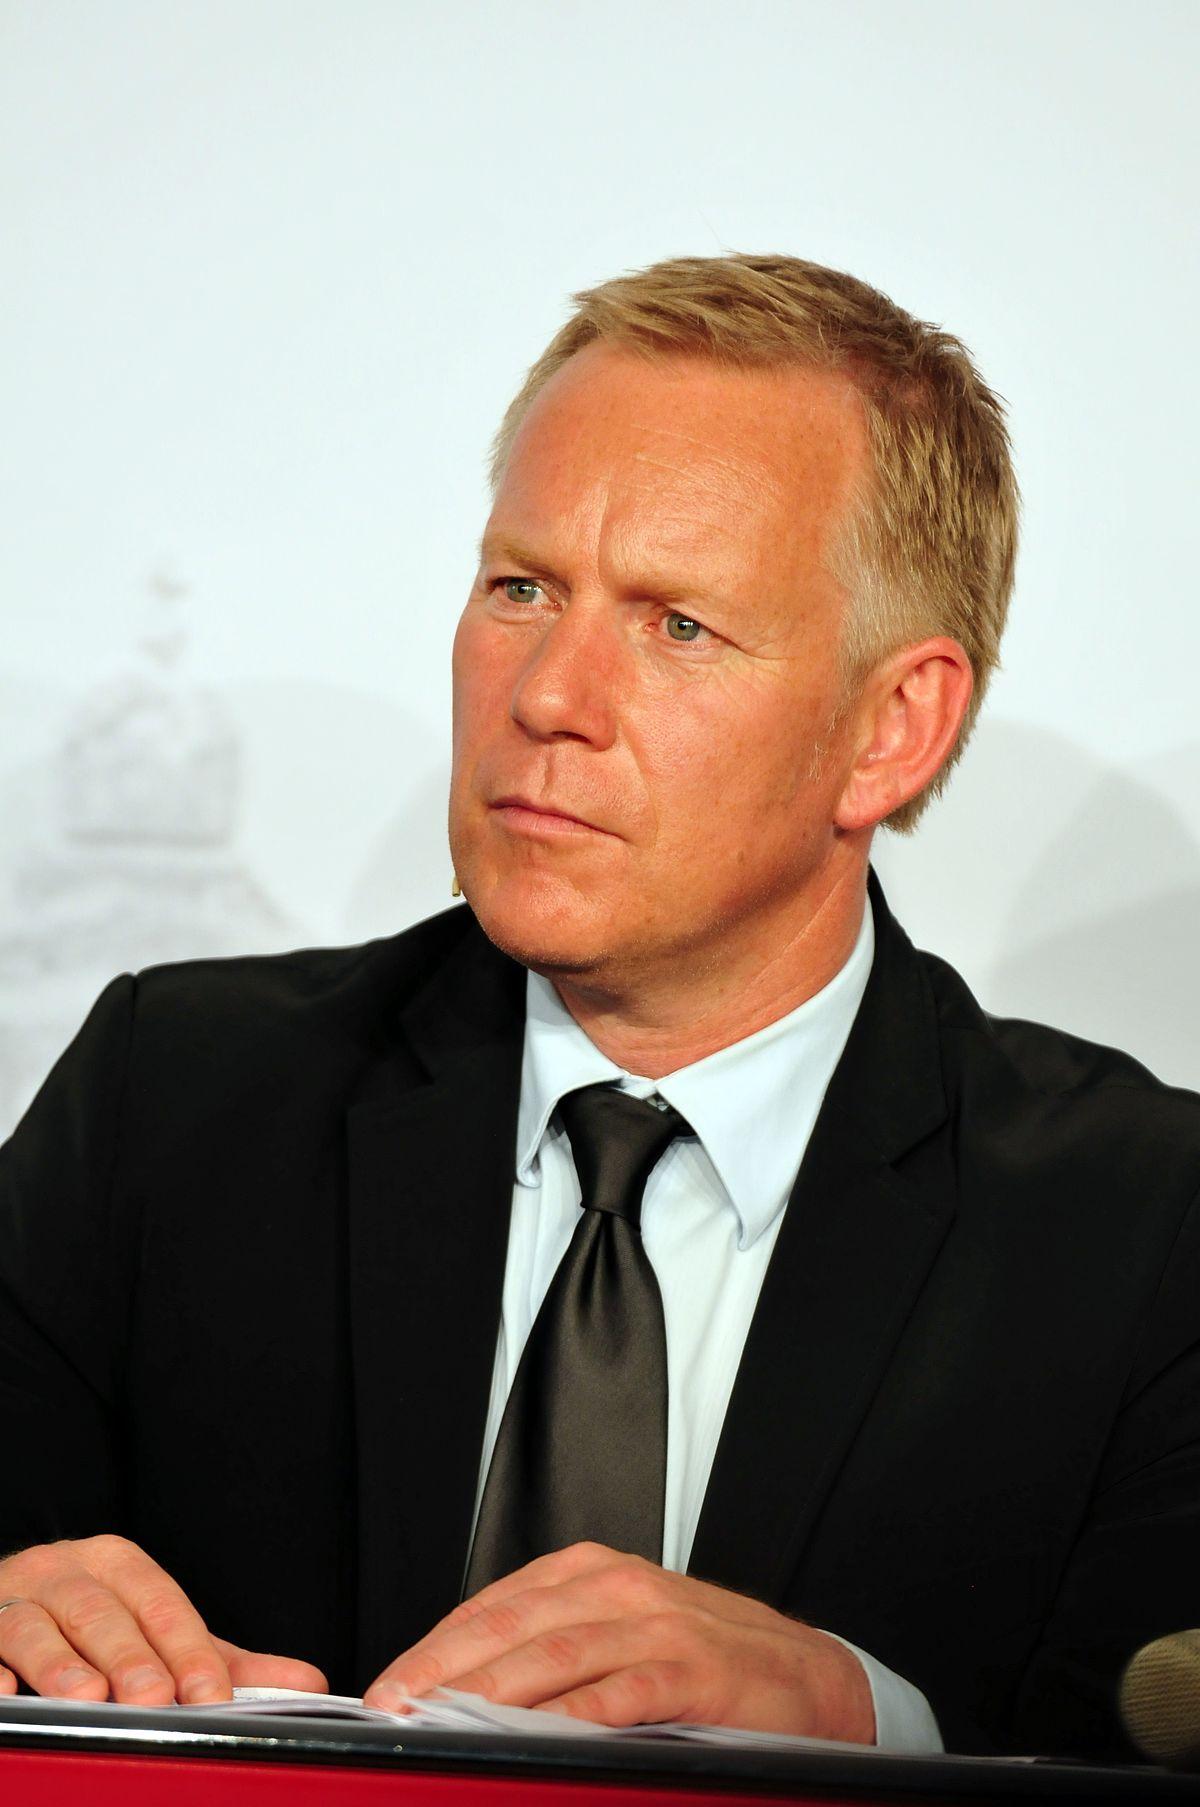 Johannes B. Kerner - Wikipedia